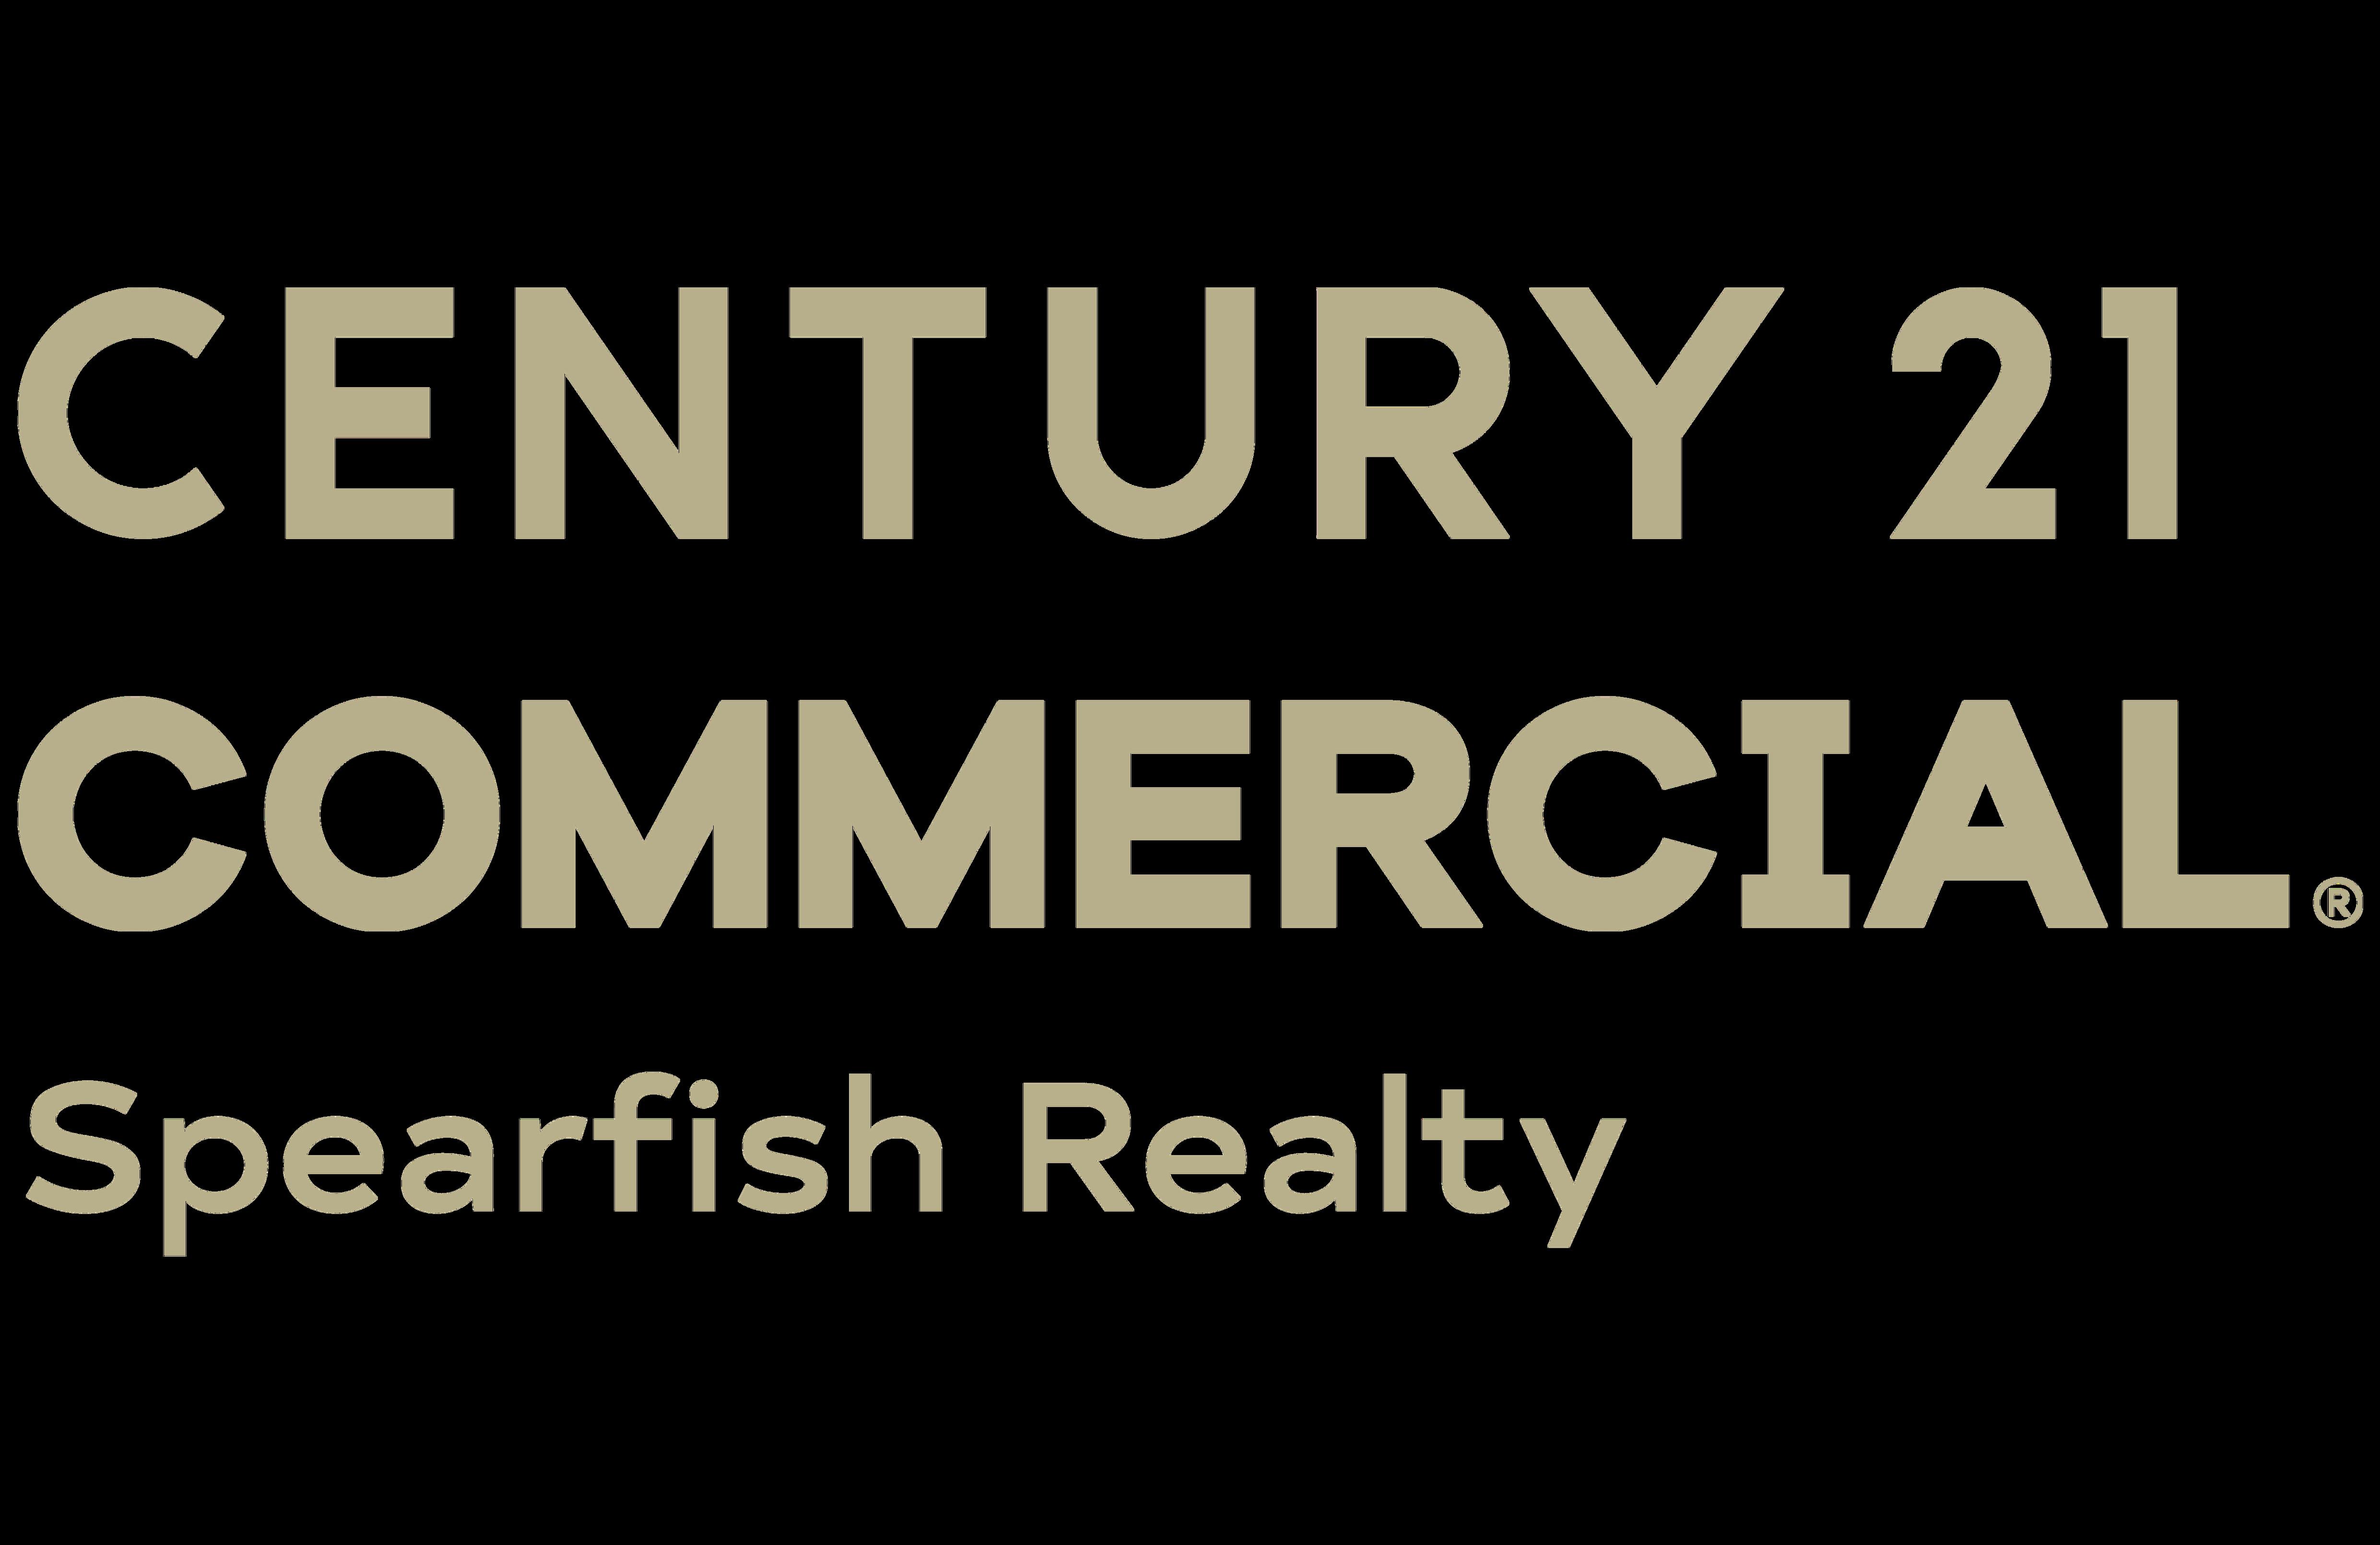 Jason Tysdal of CENTURY 21 Spearfish Realty logo